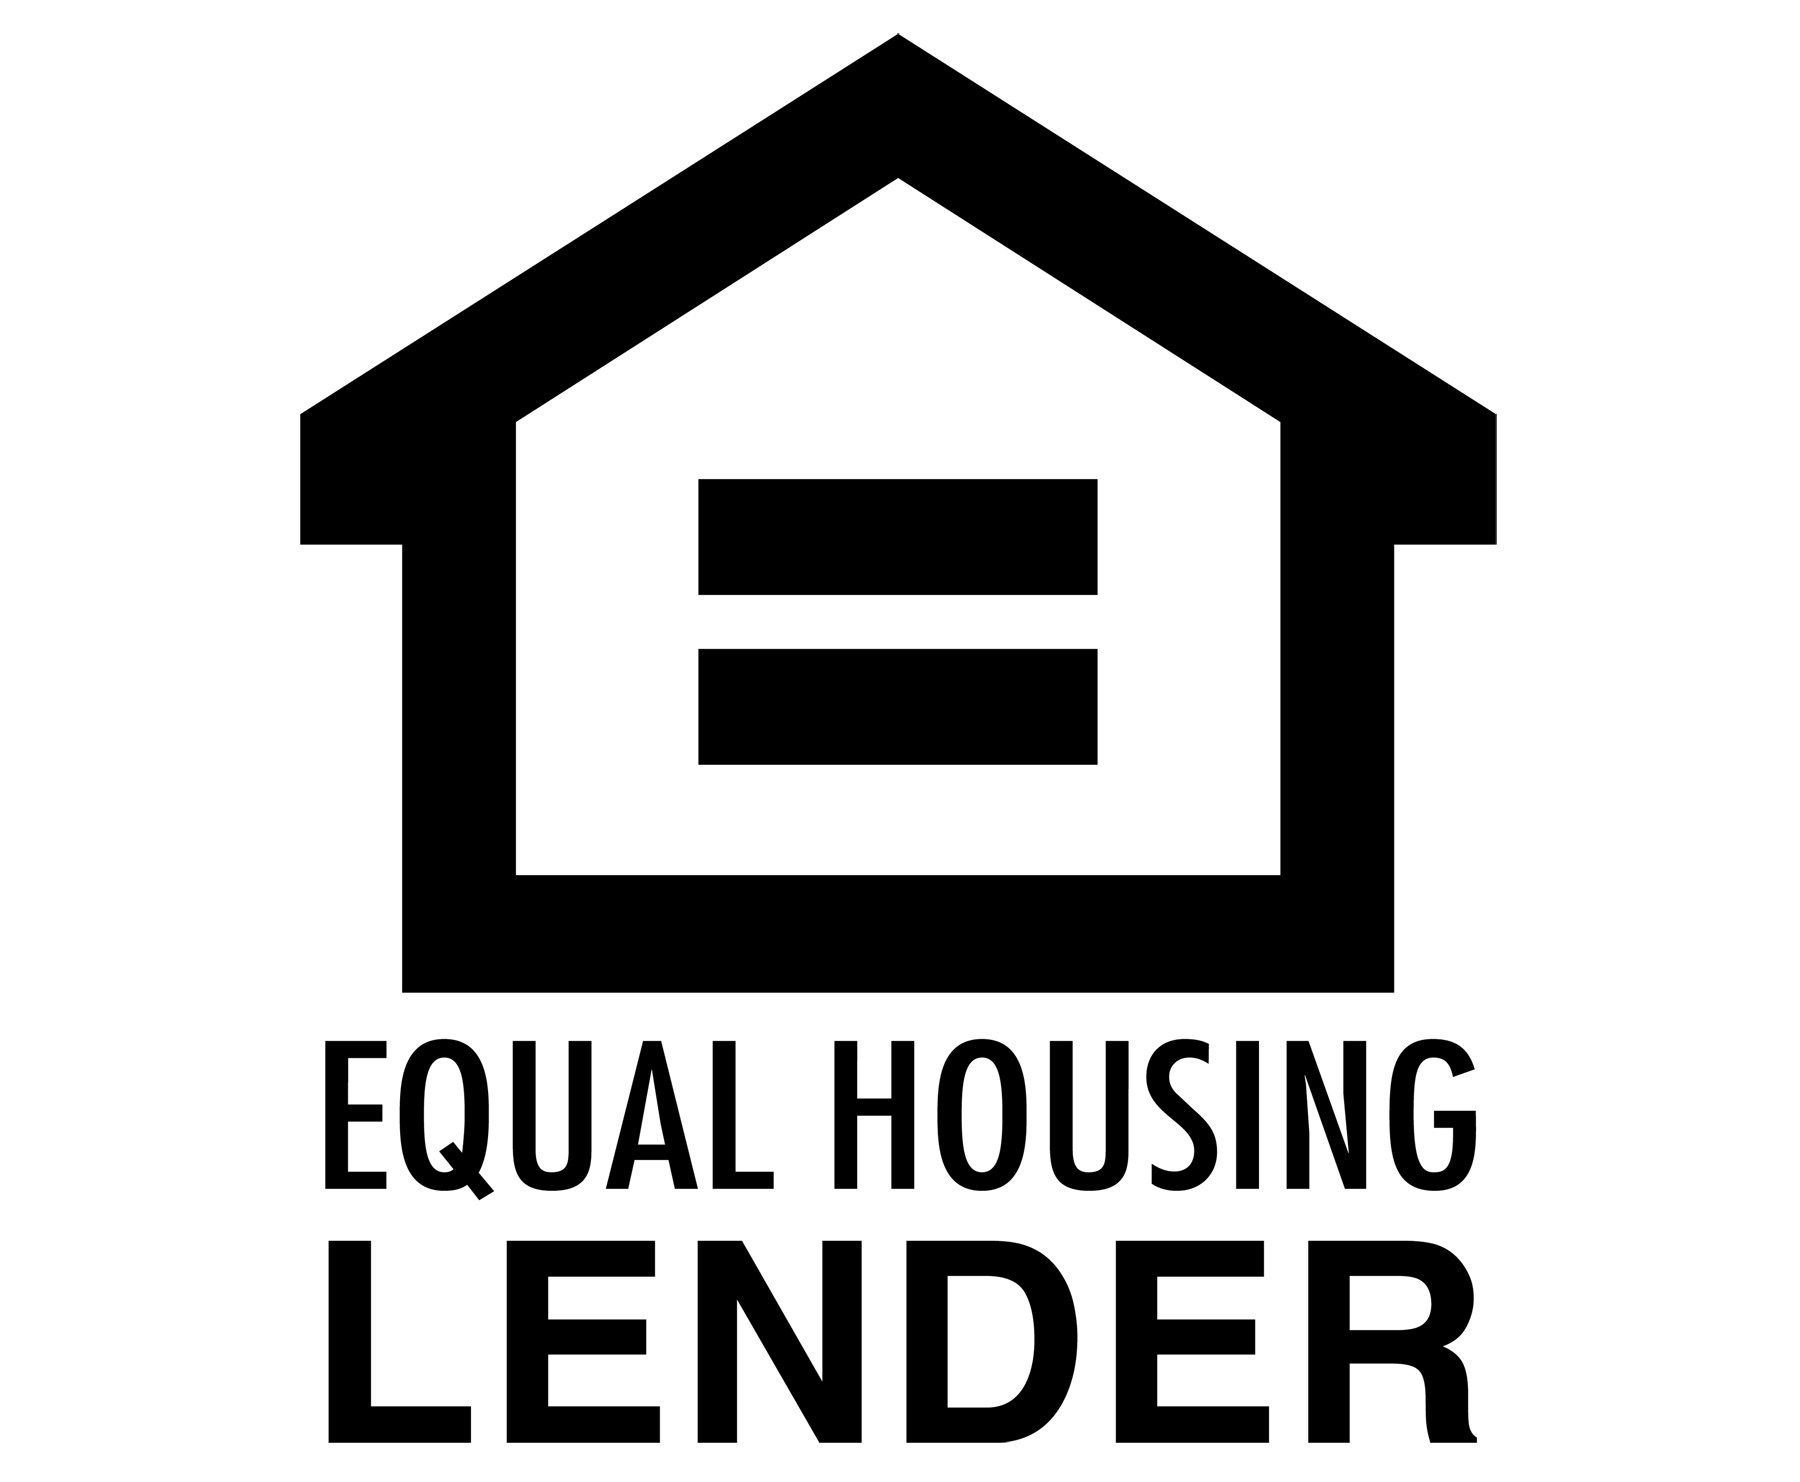 Equal Housing Logo, Equal Housing Symbol, Meaning, History ...